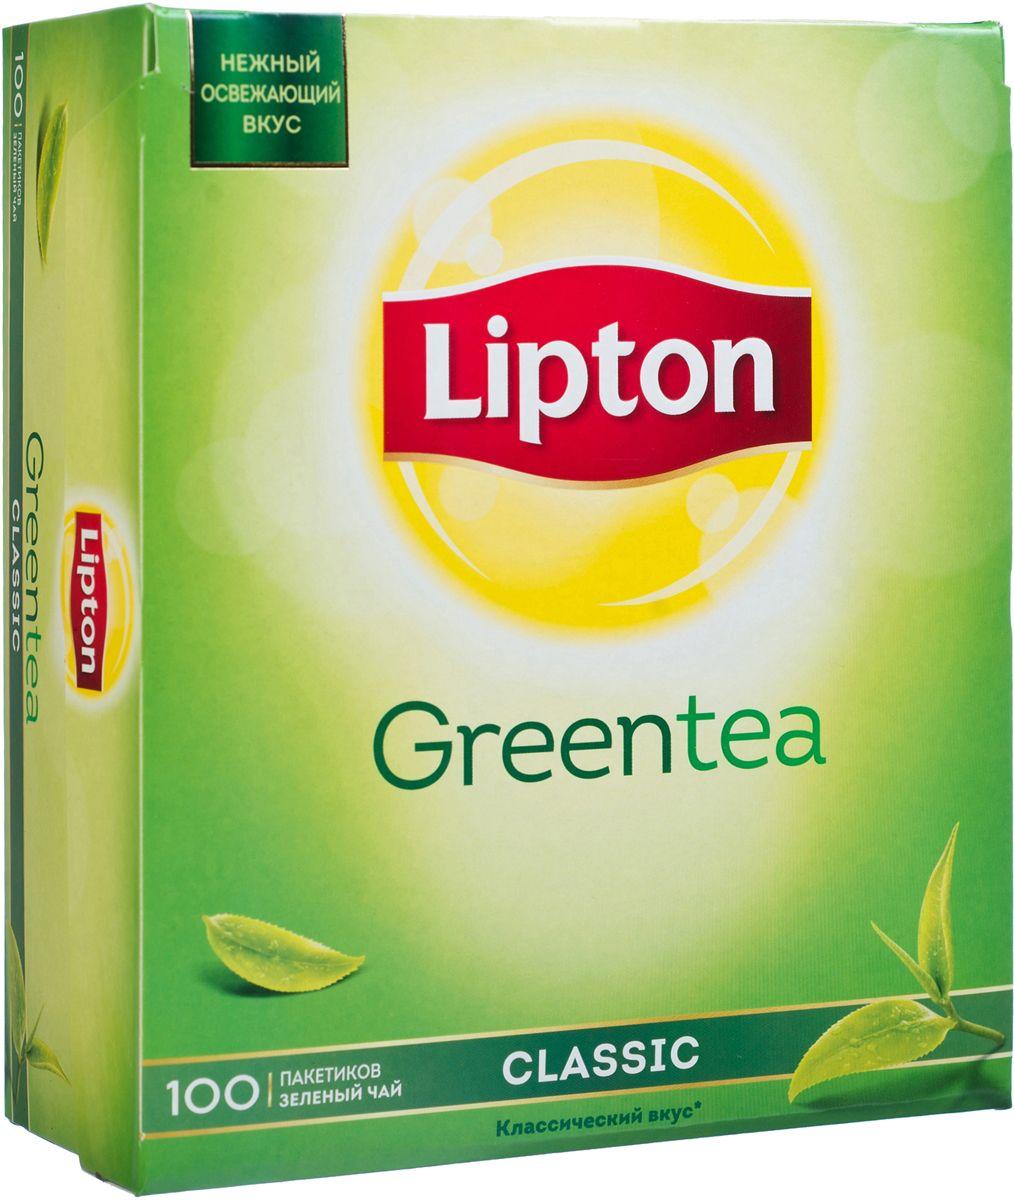 Lipton Зеленый чай Classic 100 шт lipton oriental temple чай зеленый листовой 85 г